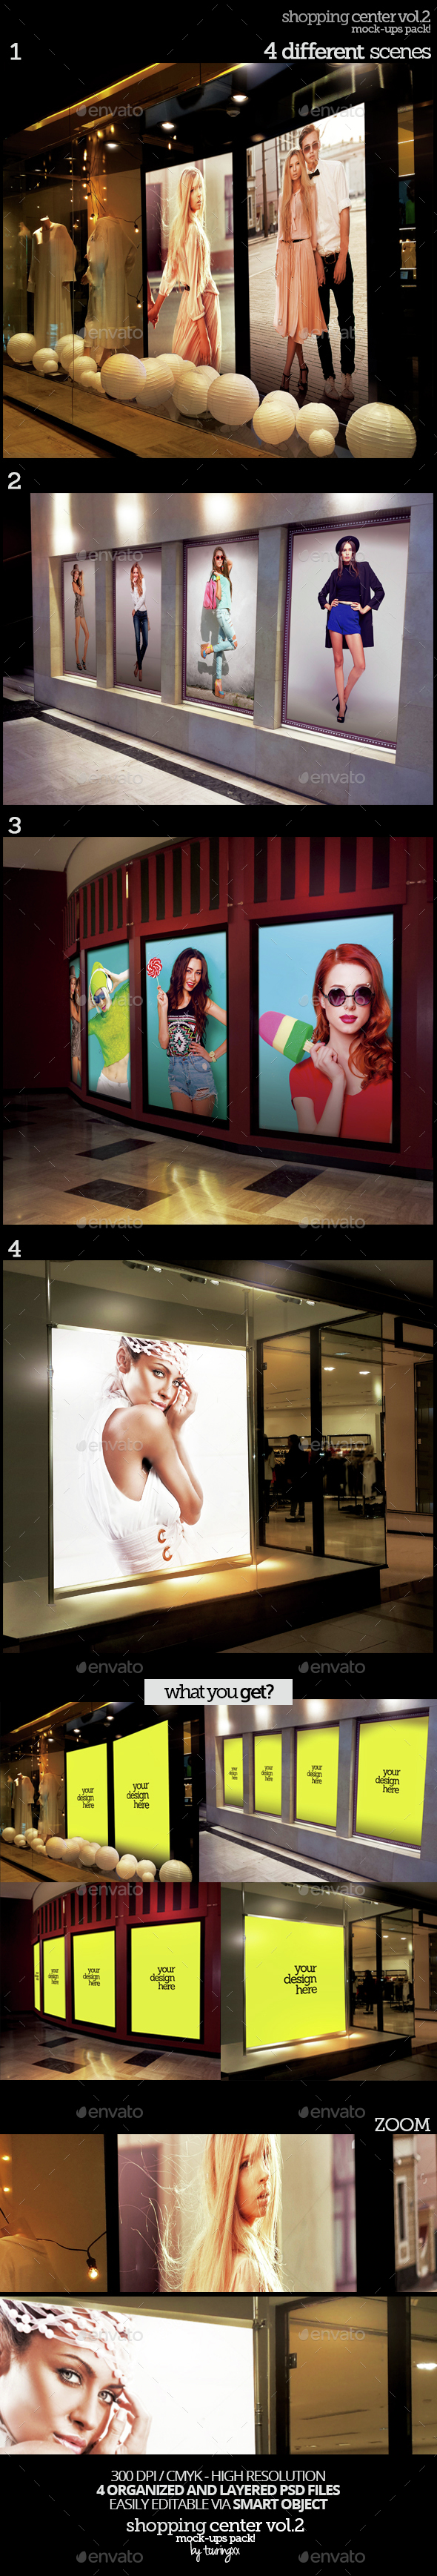 Shopping Center Vol.2 Mock-Ups Pack - Product Mock-Ups Graphics